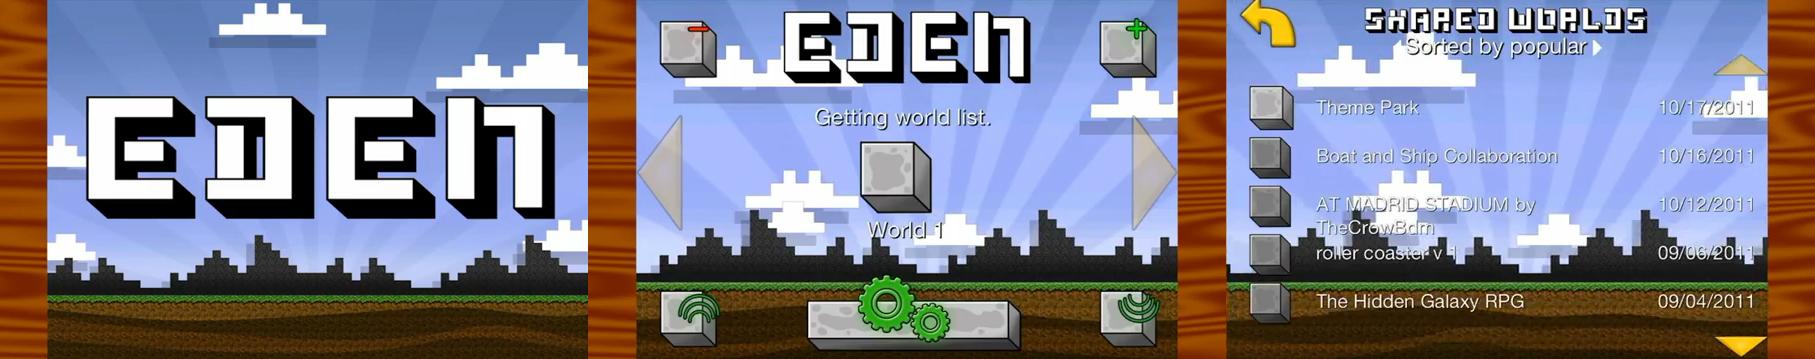 OSTBLOCK in use — Game App